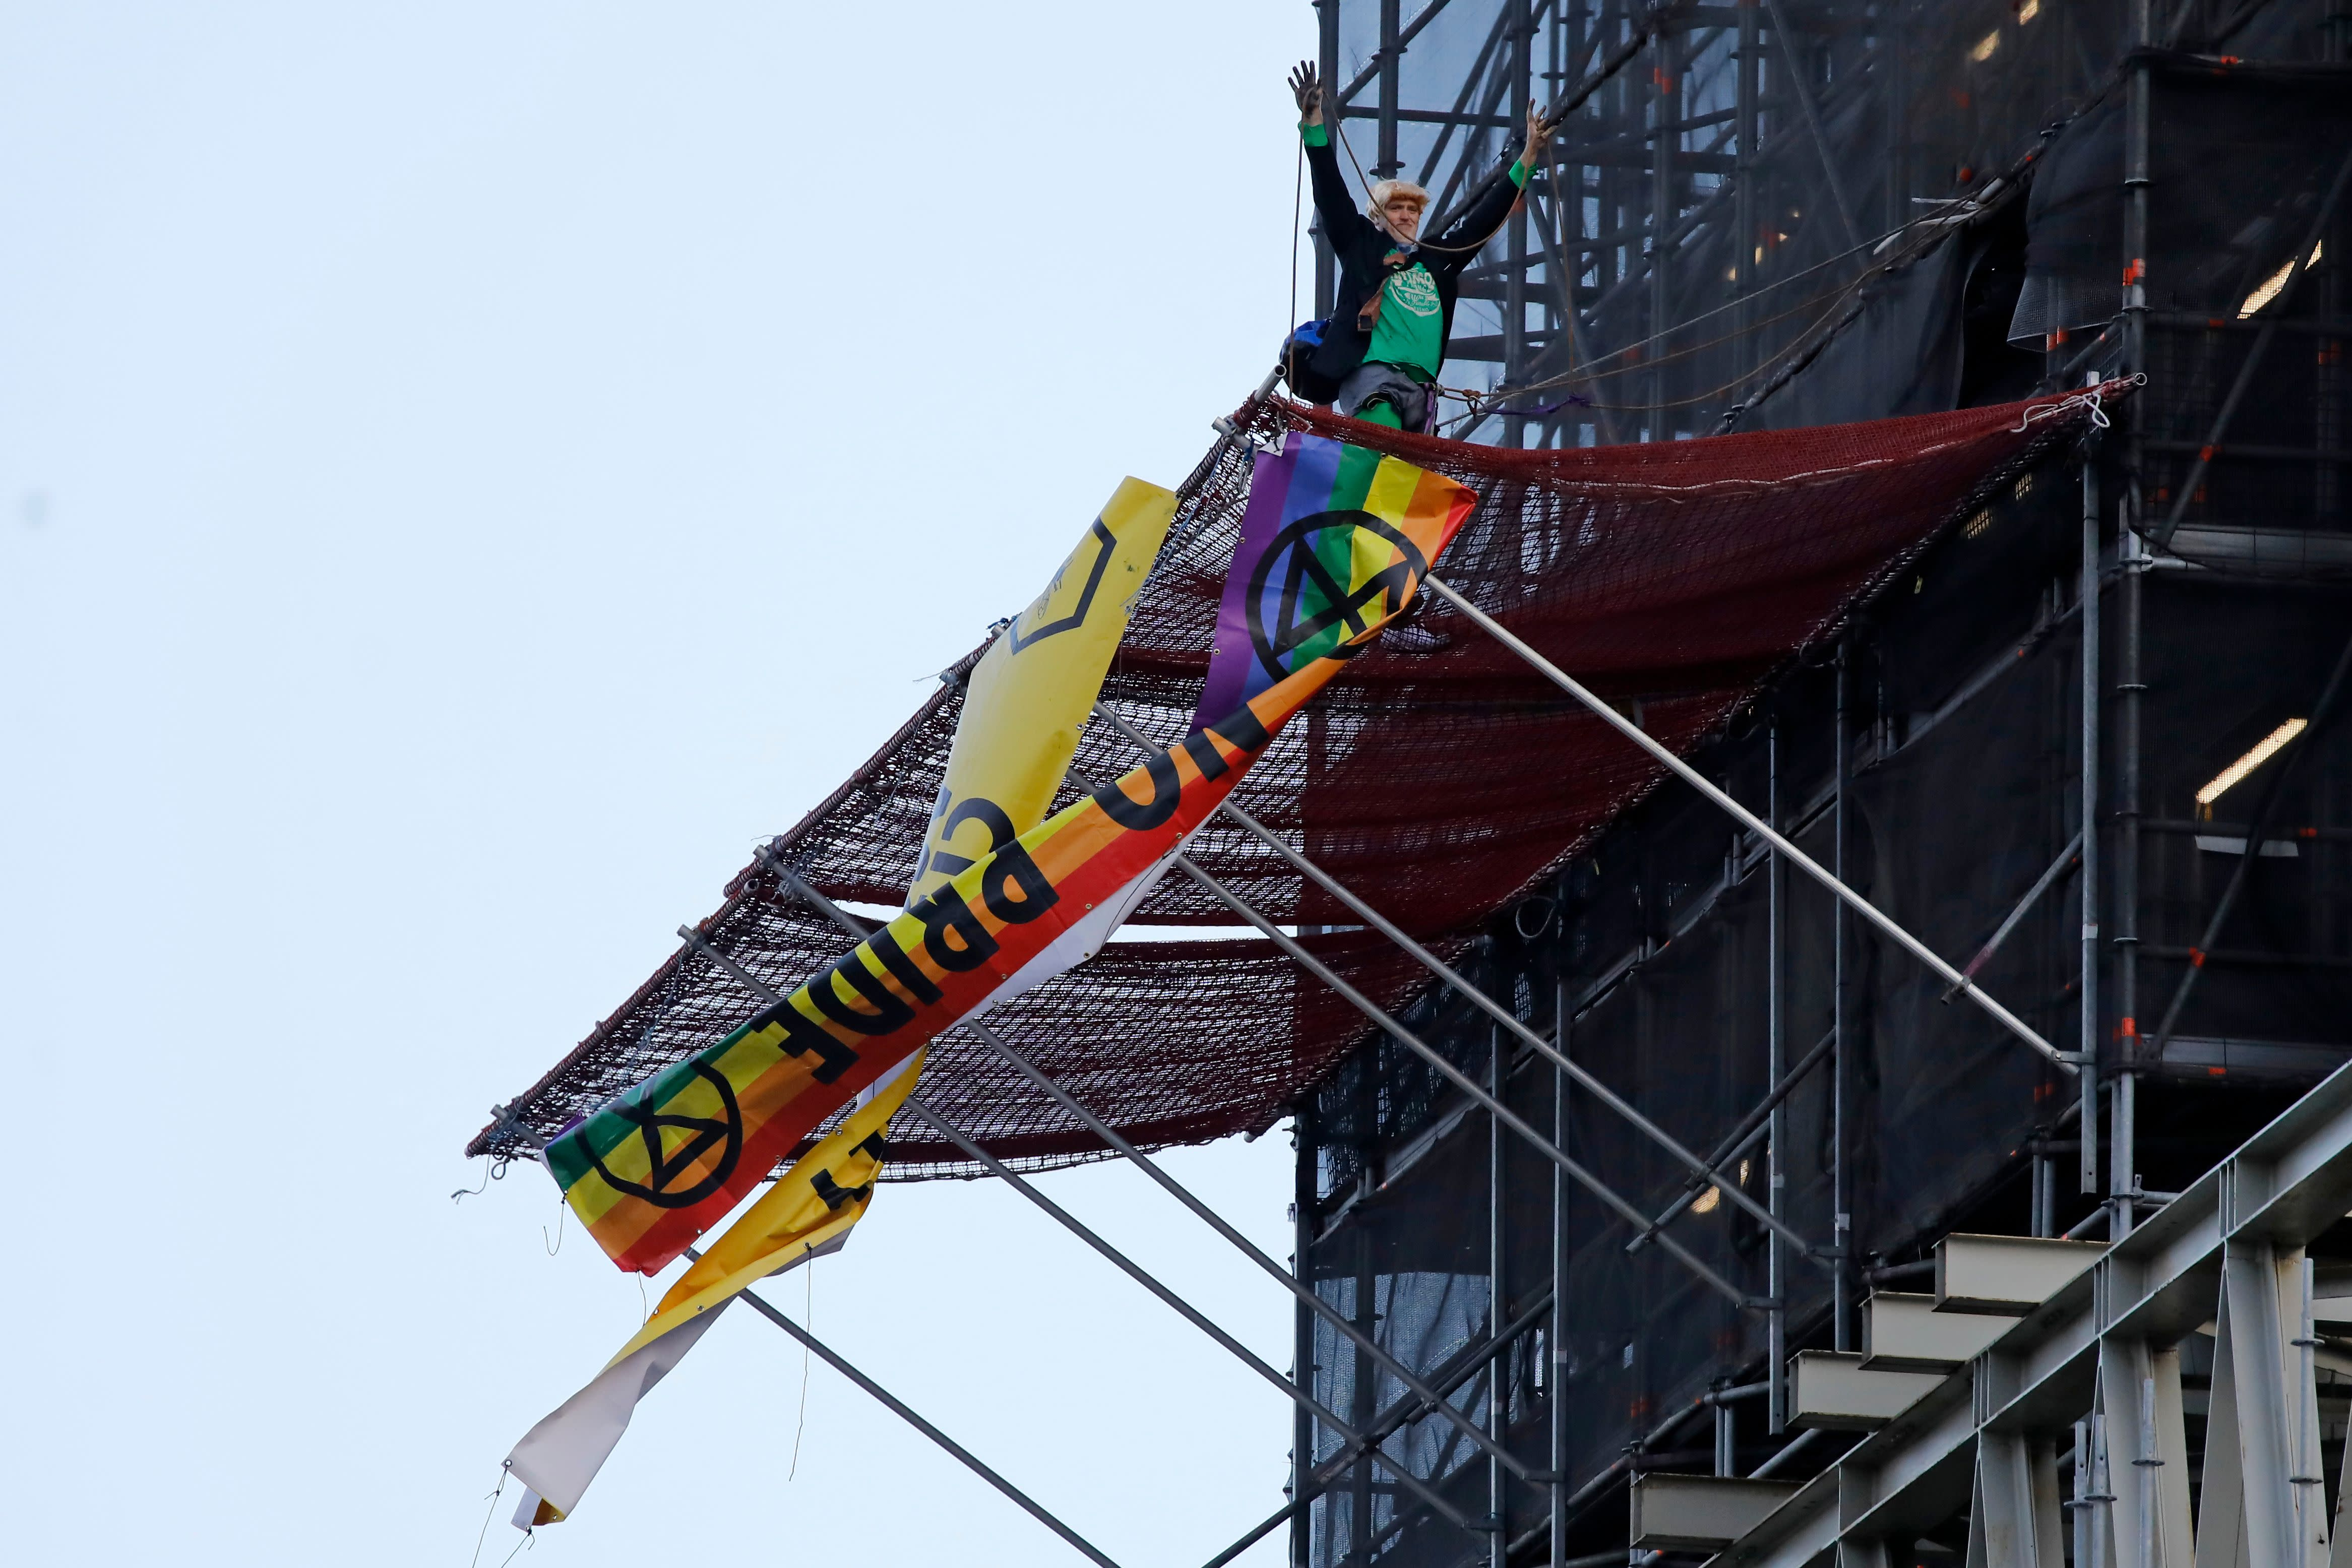 Extinction Rebellion activist dressed as Boris Johnson climbs up Big Ben in climate change protest